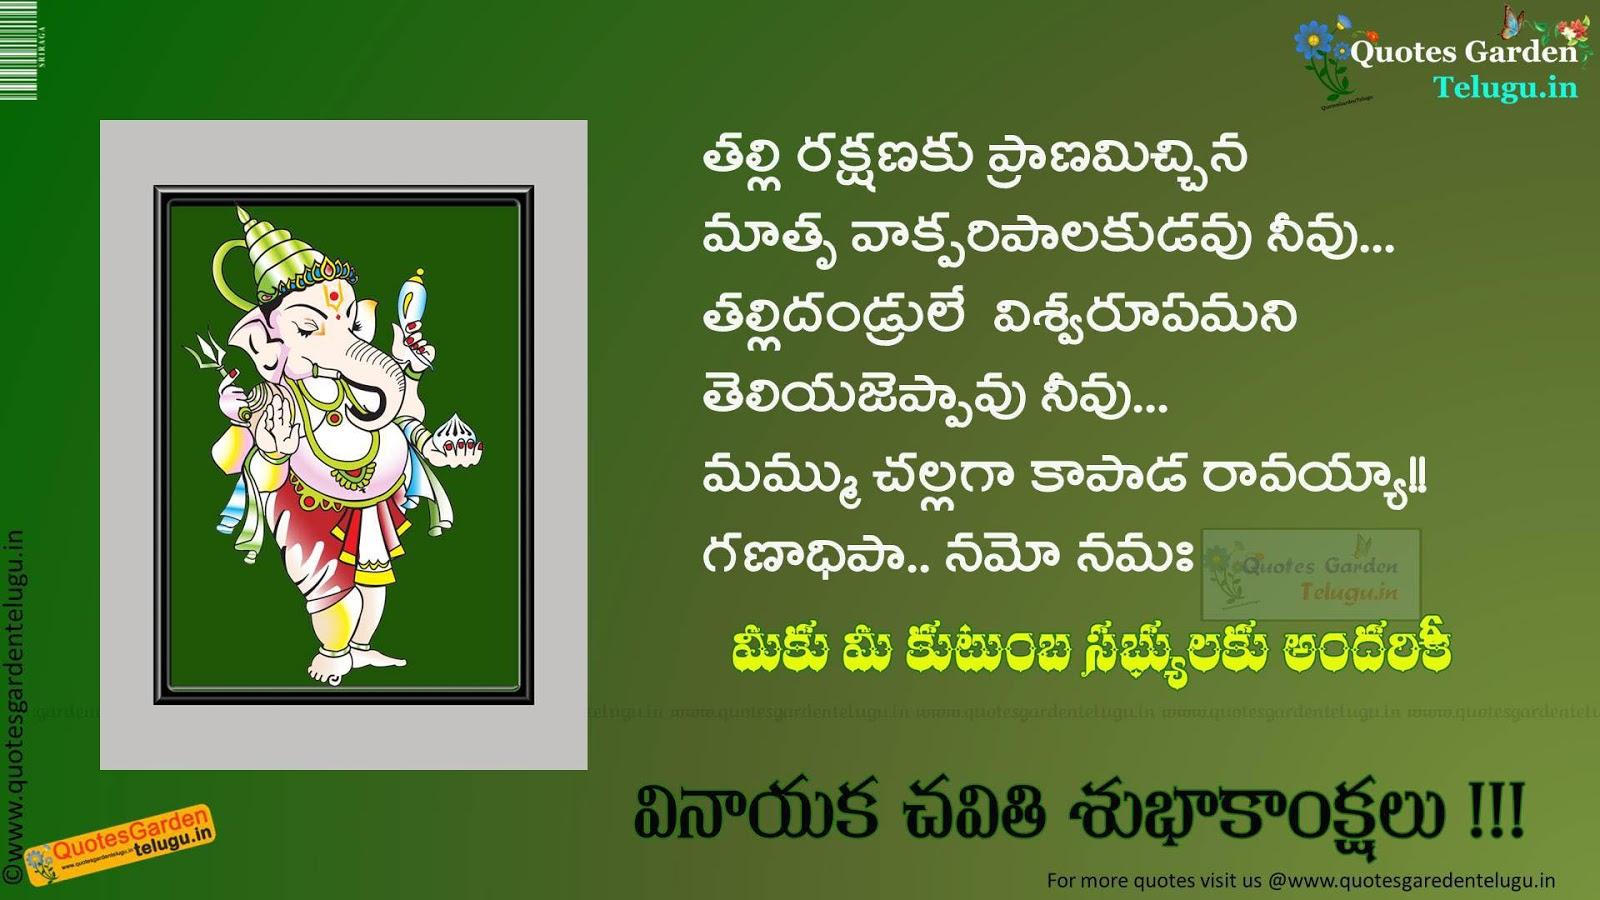 Ganesh images with quotes slokas 2017 happy2bganesh2bchaturthi117 m4hsunfo Gallery